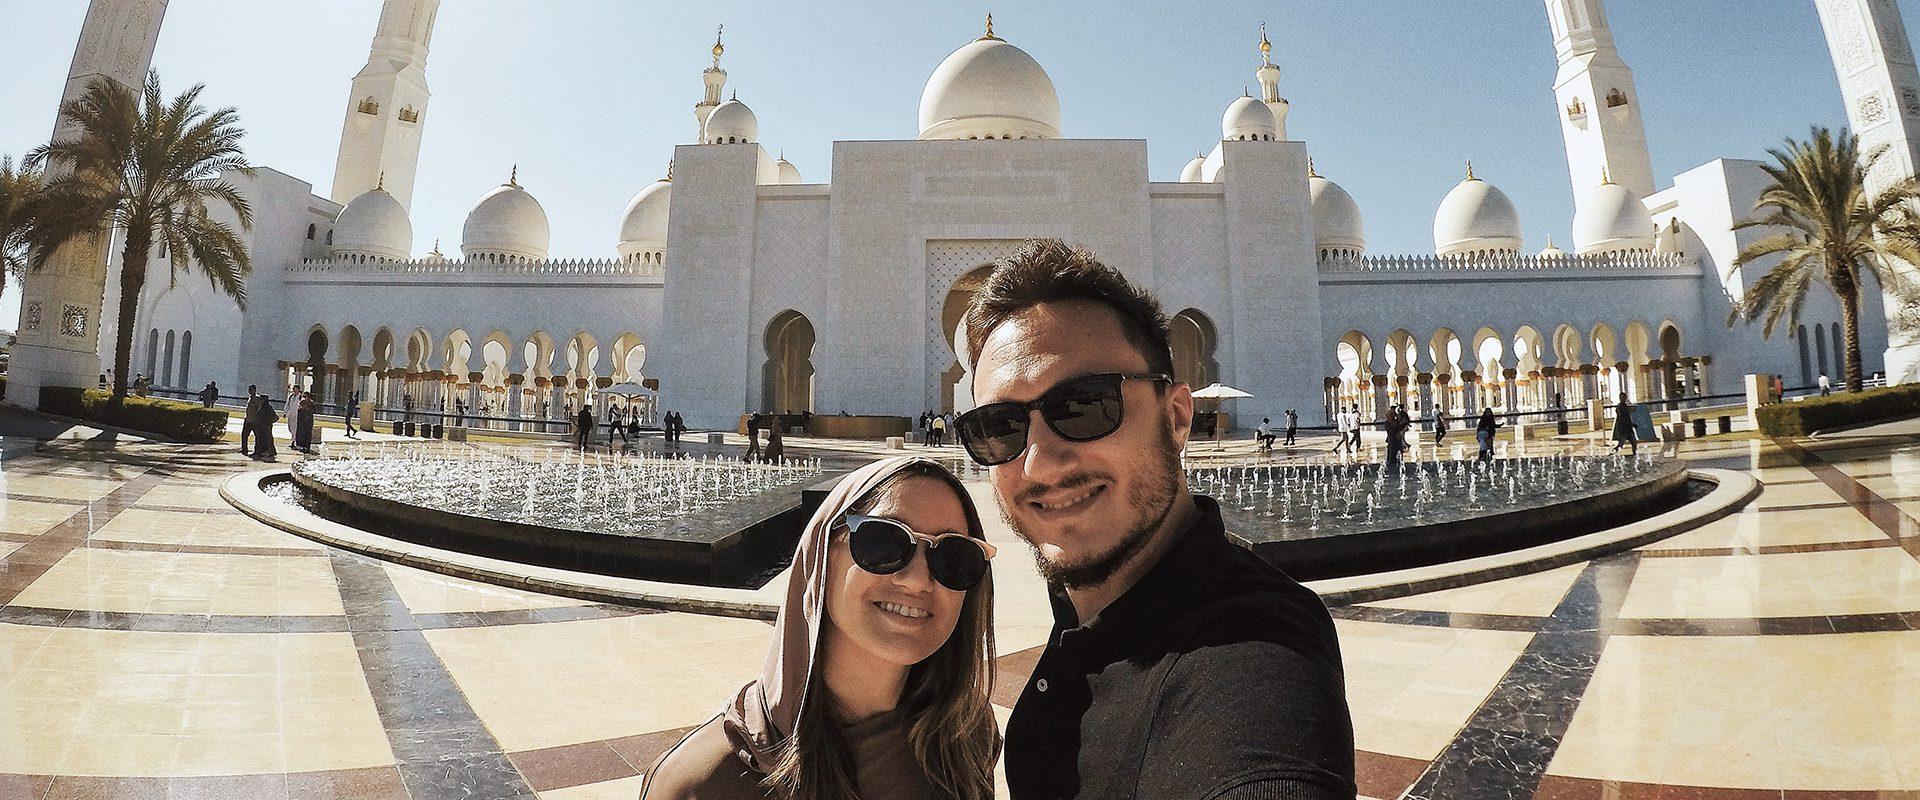 Visita a la Gran Mezquita de Abu Dhabi